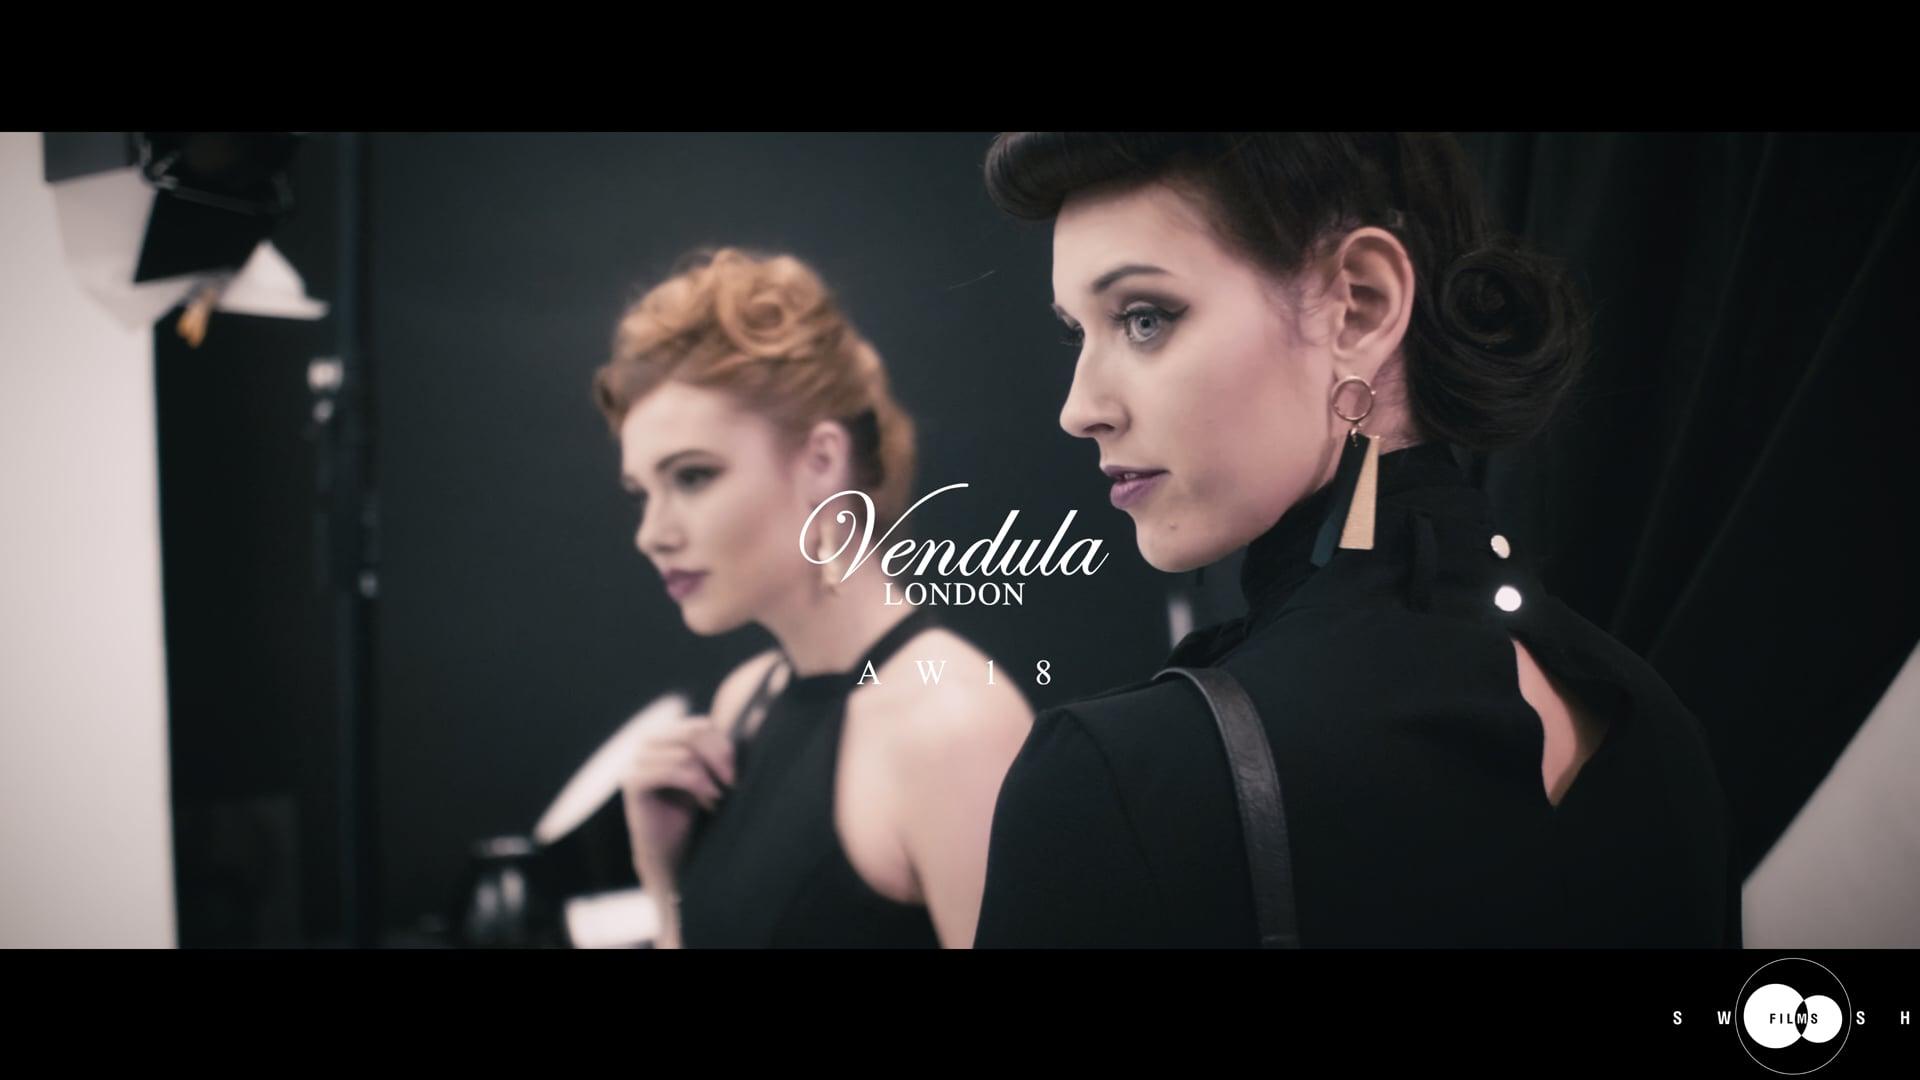 Fashion Accessories, Vendula London, Behind The Scenes, Fashion Shoot,Quirky Fashion, Vintage Fashion, photo shoot, AW18